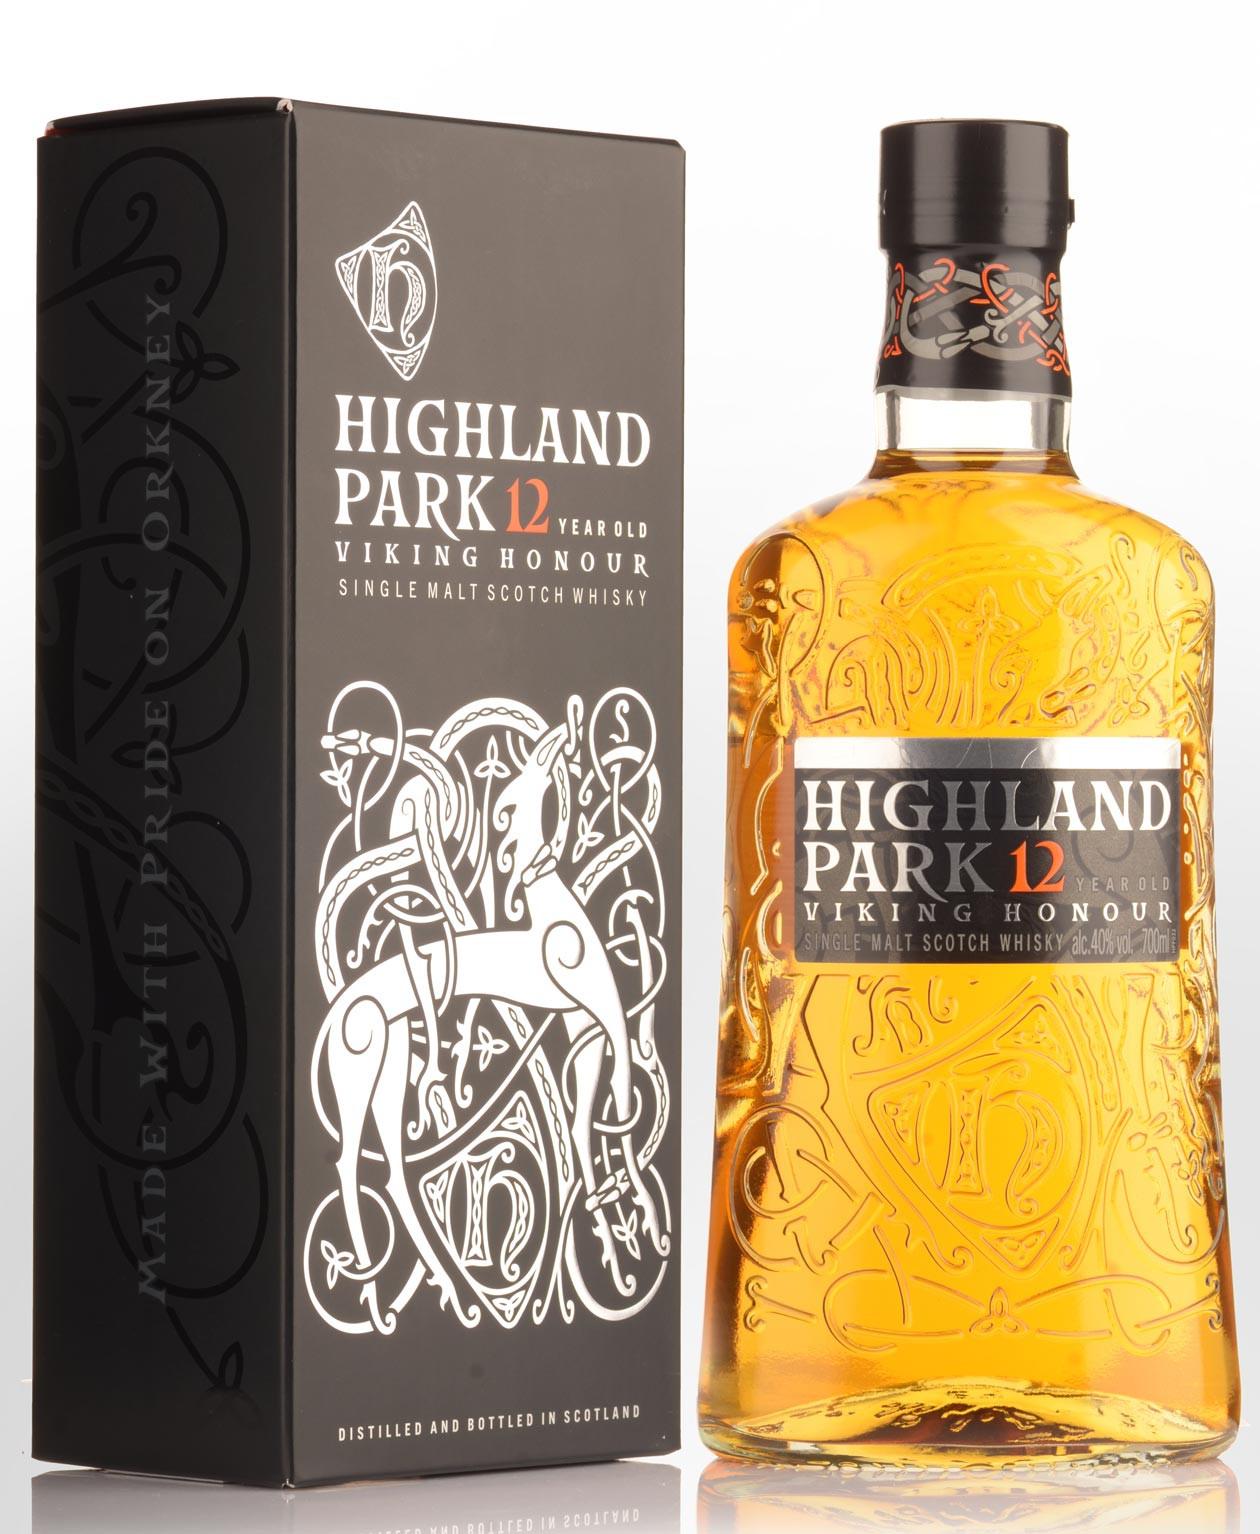 Highland Park 12 Year Old Single Malt Scotch Whisky 750ML